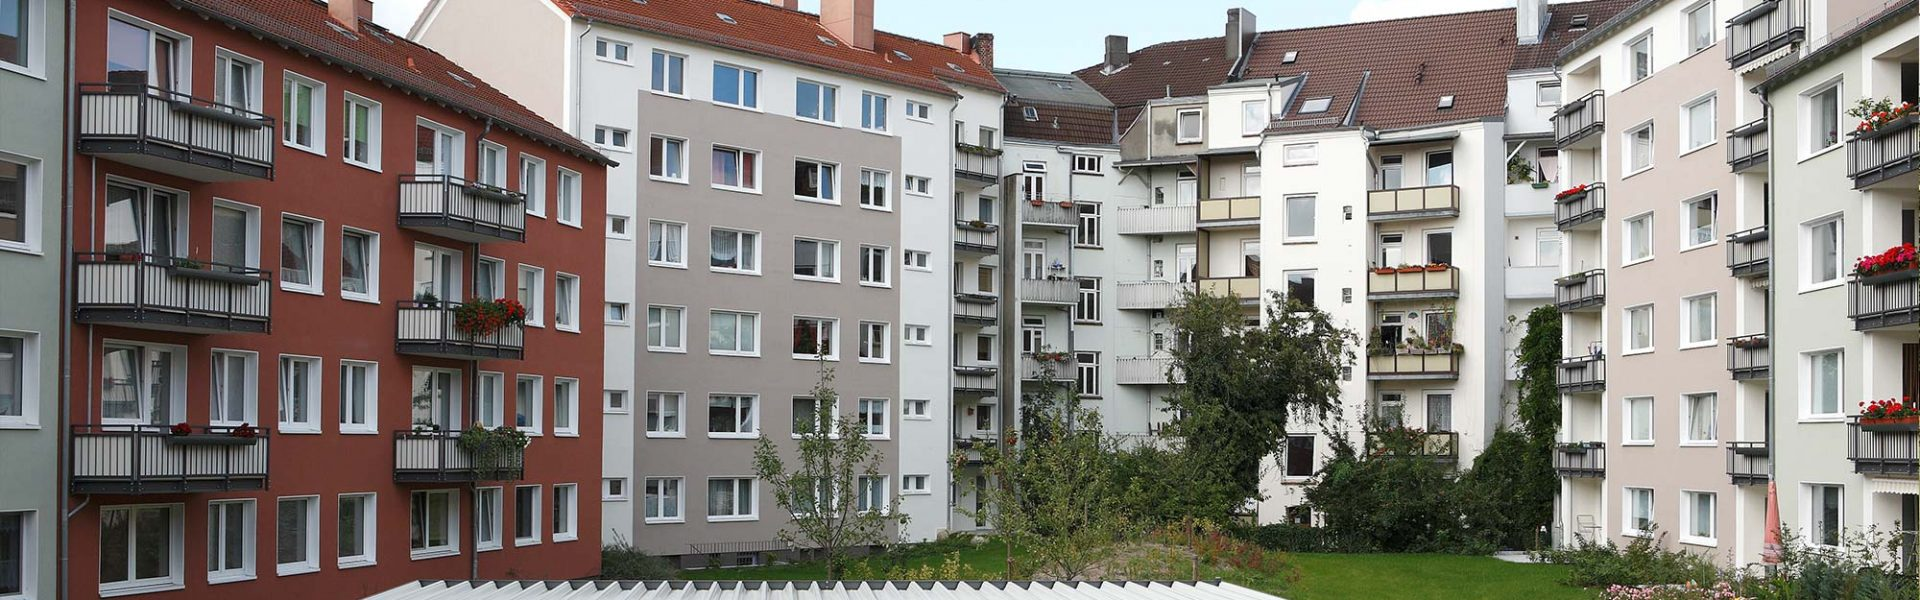 Max-Planck-Straße 20-24, Kiel